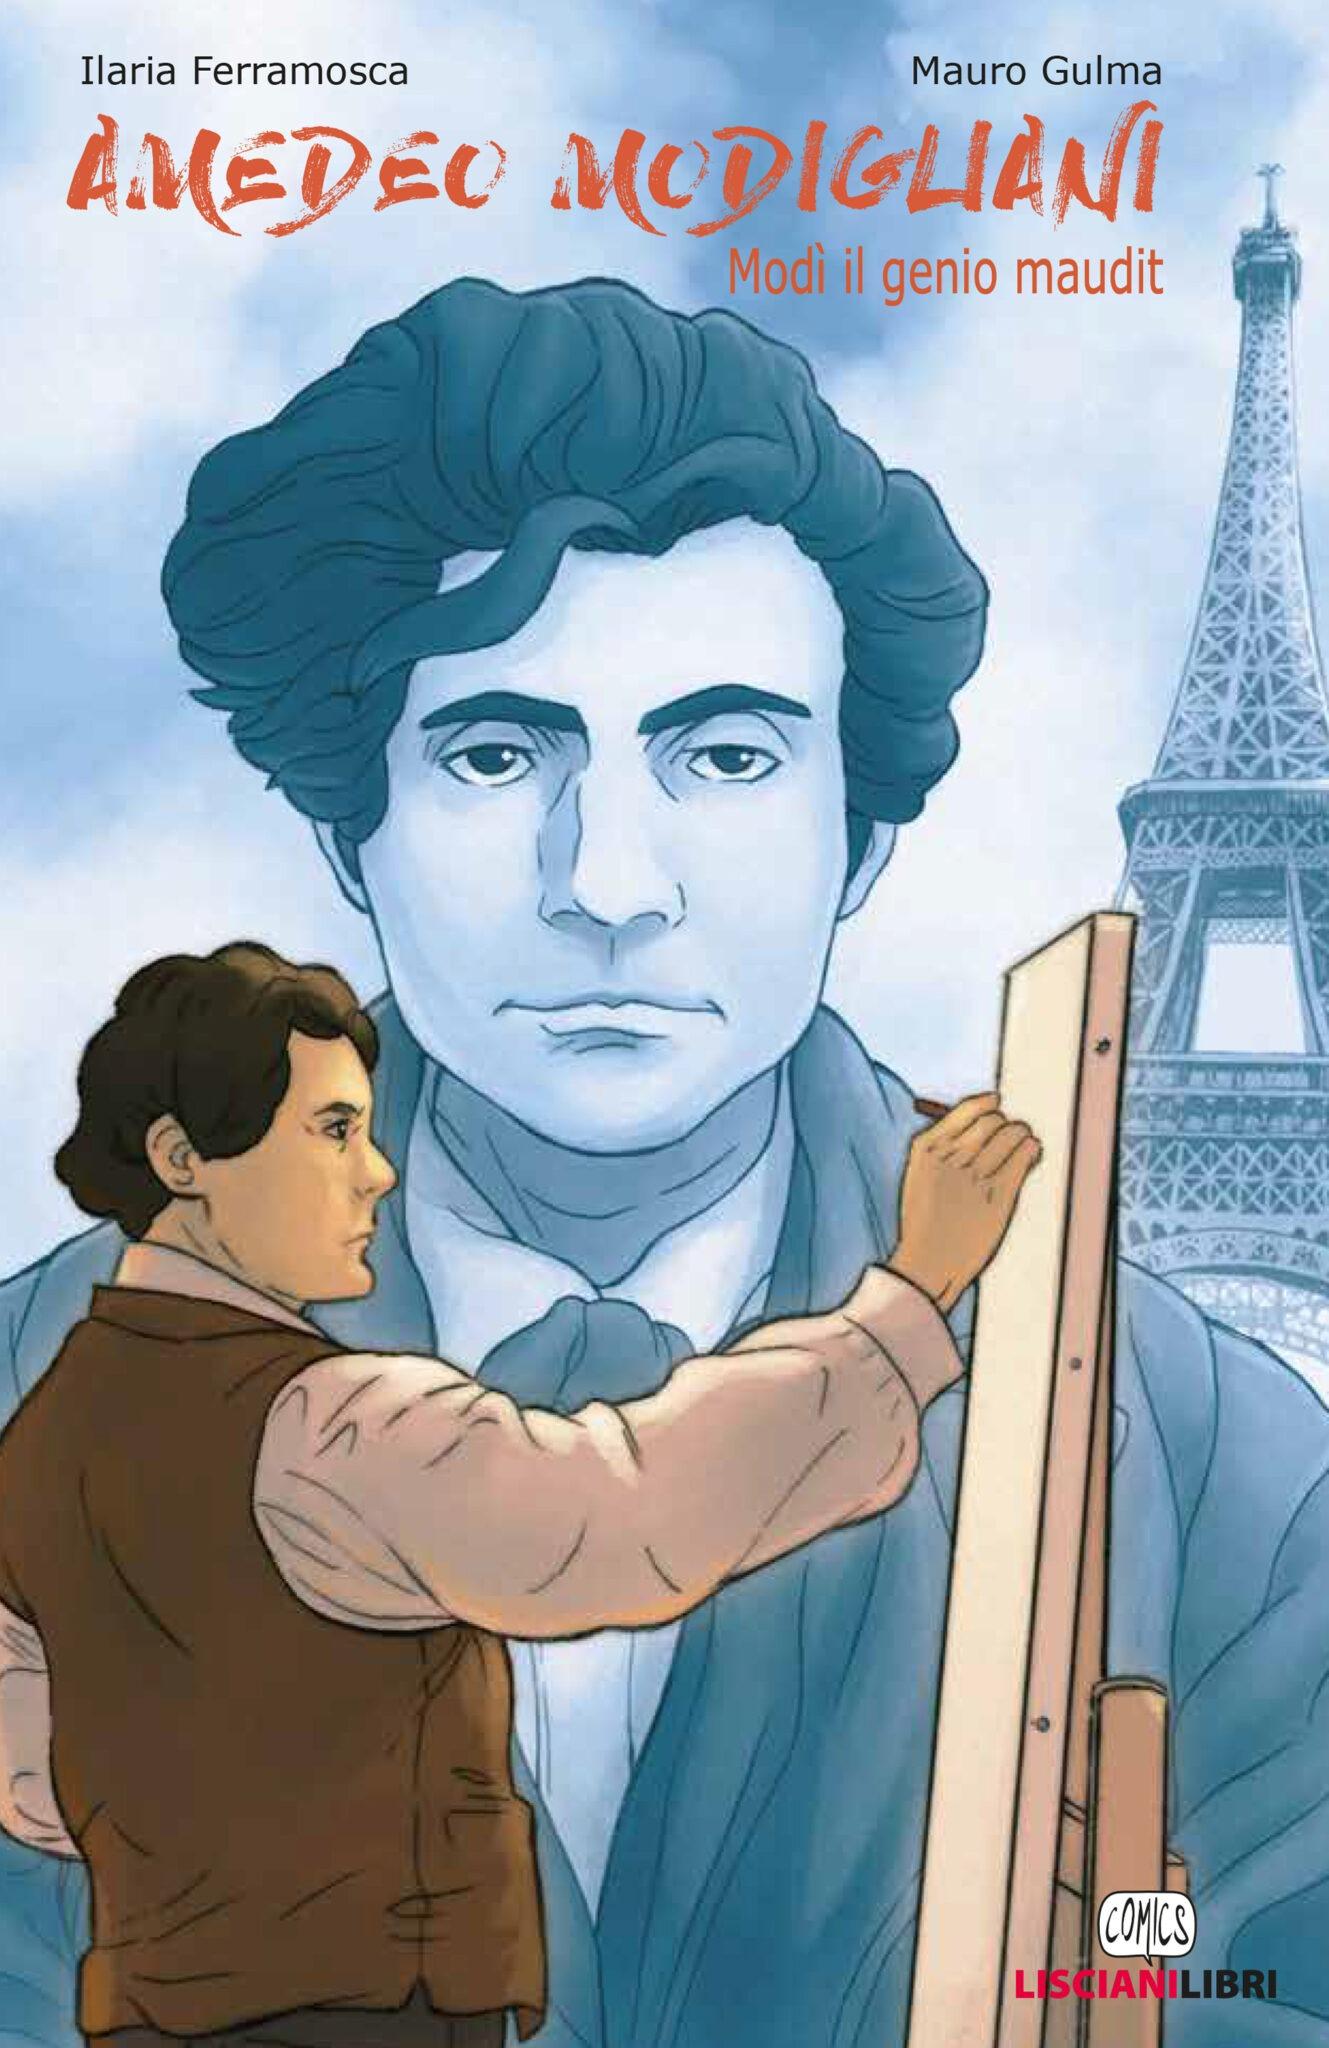 Recensione di Amedeo Modigliani – I. Ferramosca / M. Gulma